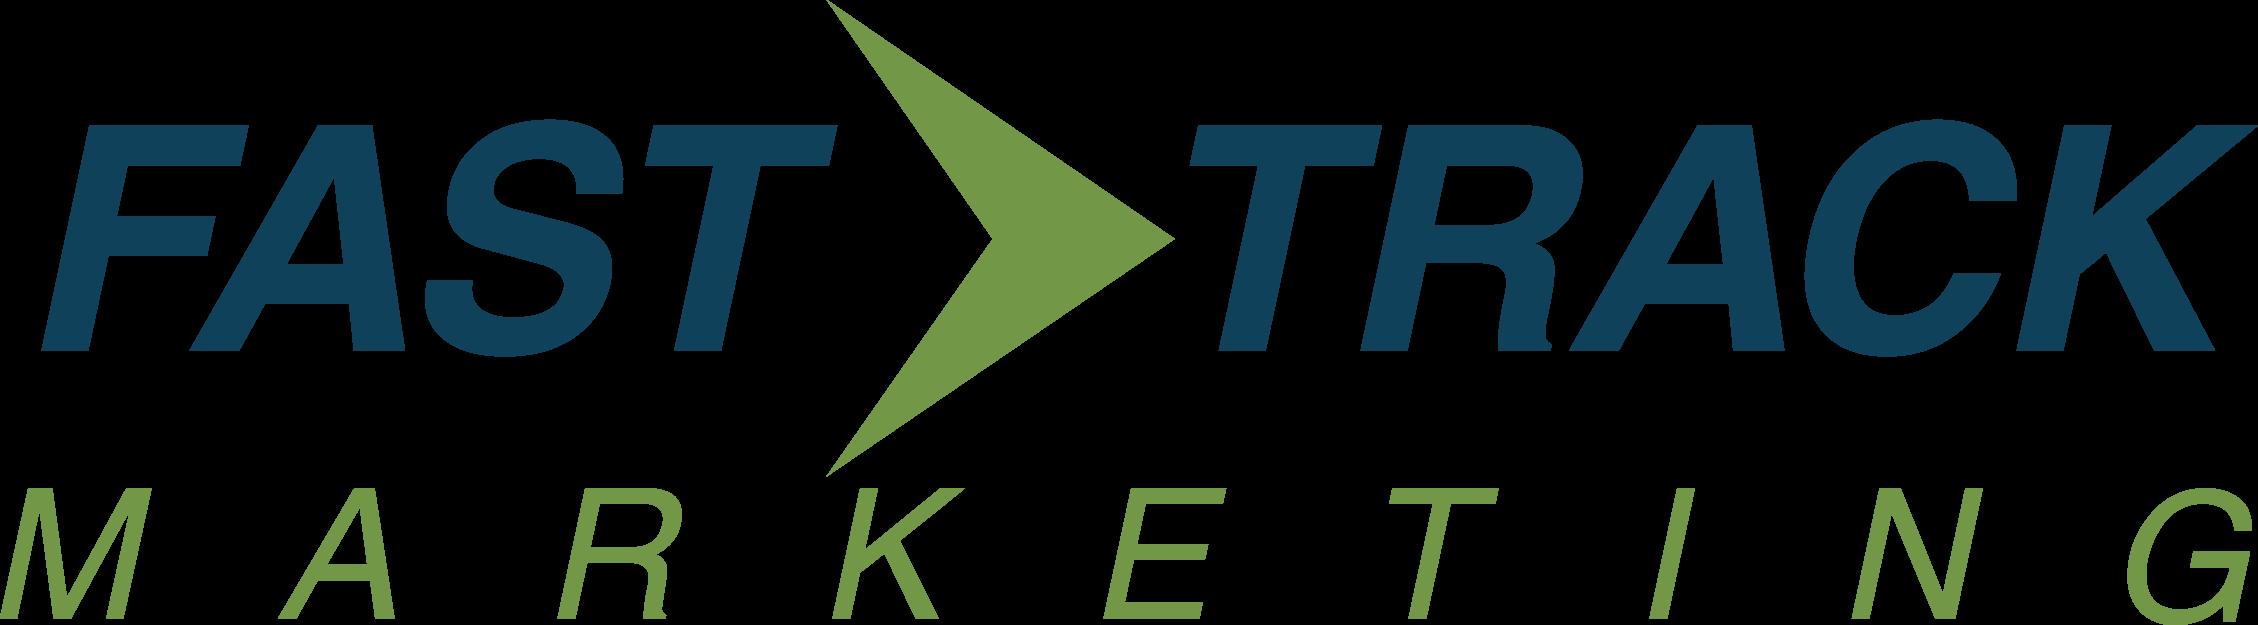 Fast Track Marketing Logo.png